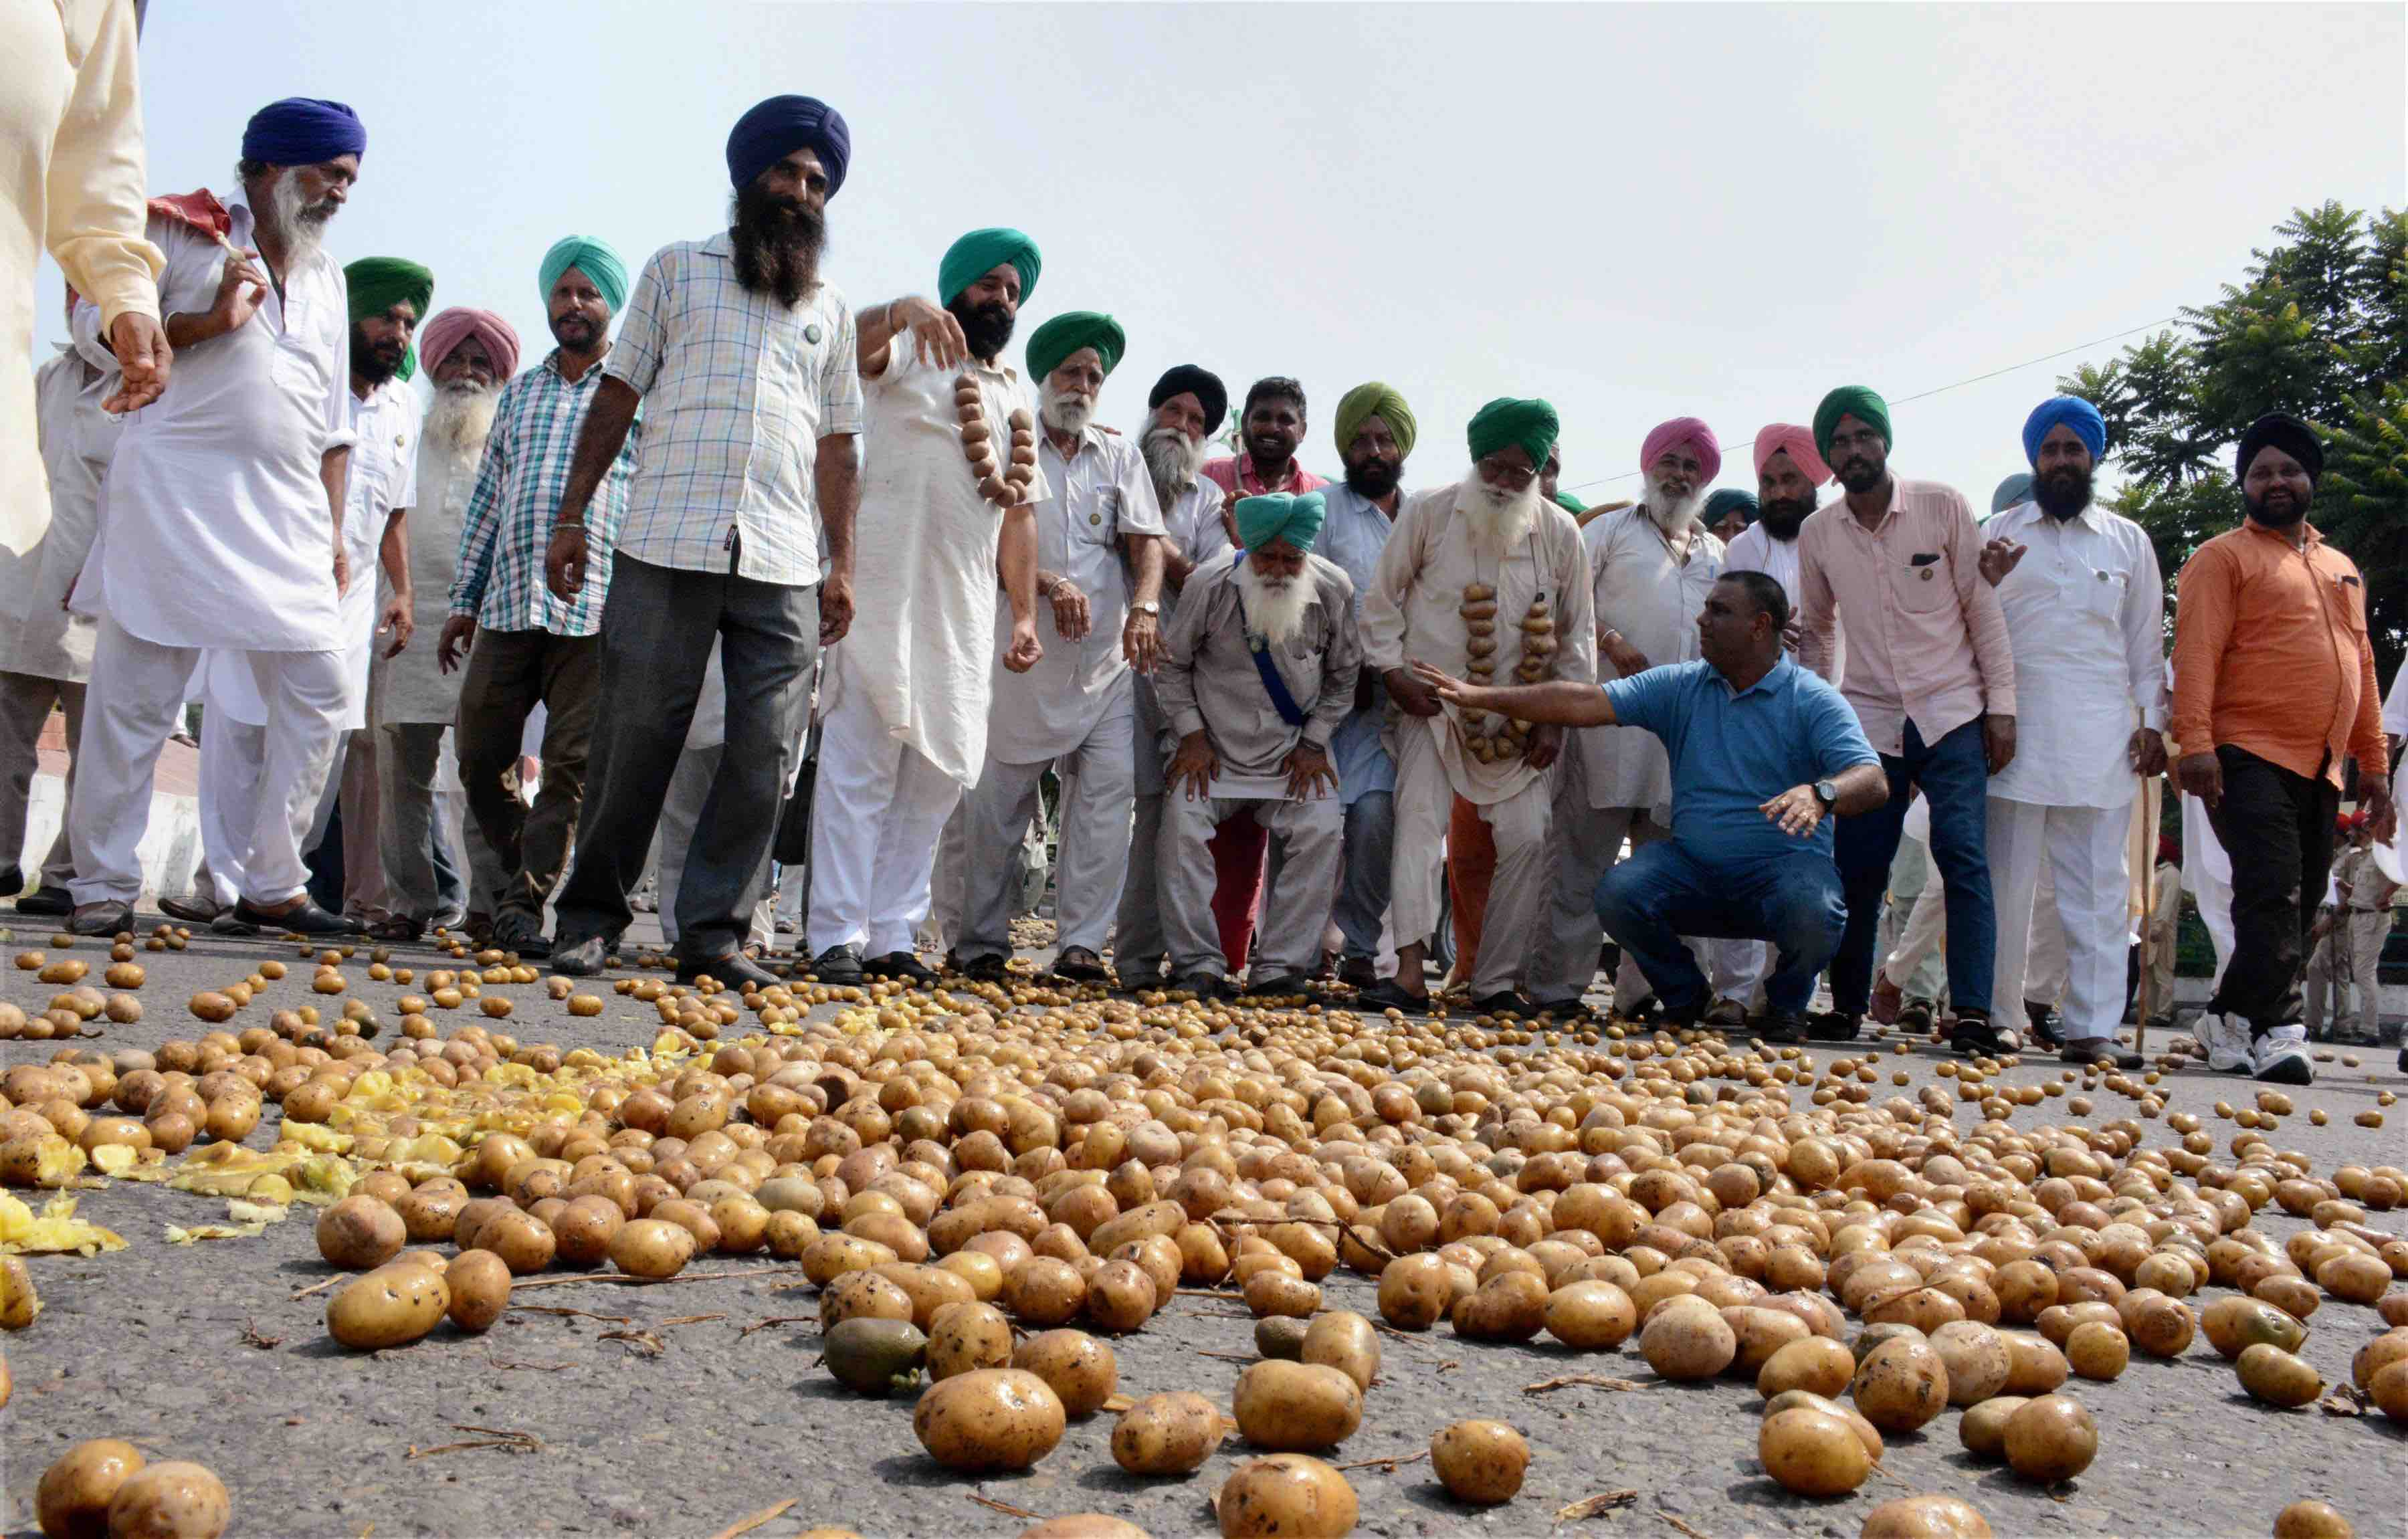 Farmers in Chhattisgarh, Punjab Allege 'Anti-Democratic' Police Crackdown on Protests